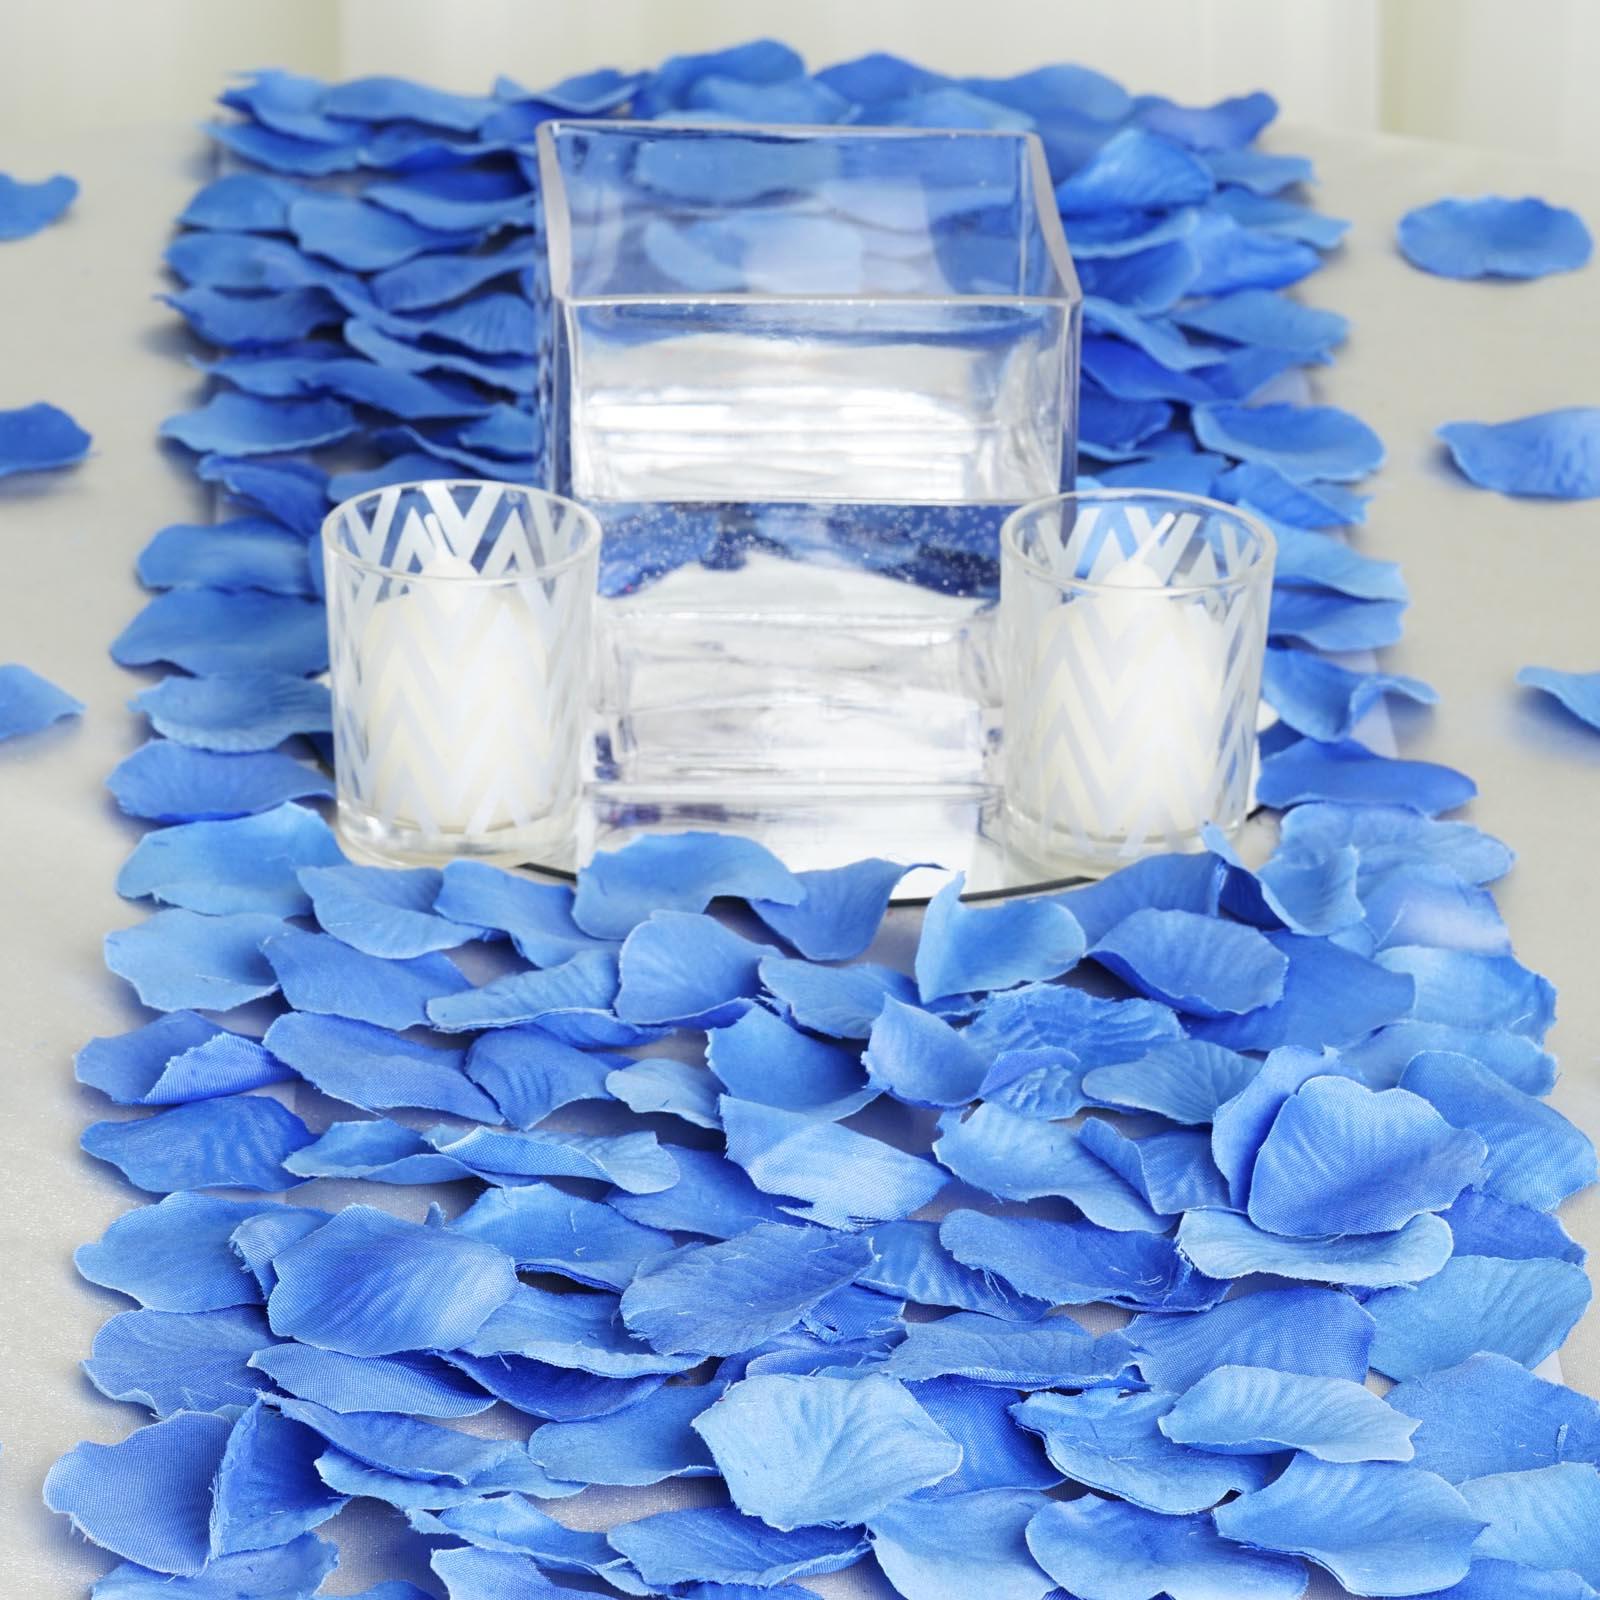 BalsaCircle 500 Silk Rose Petals Wedding Decorations Bulk ...   450 x 450 jpeg 50kB